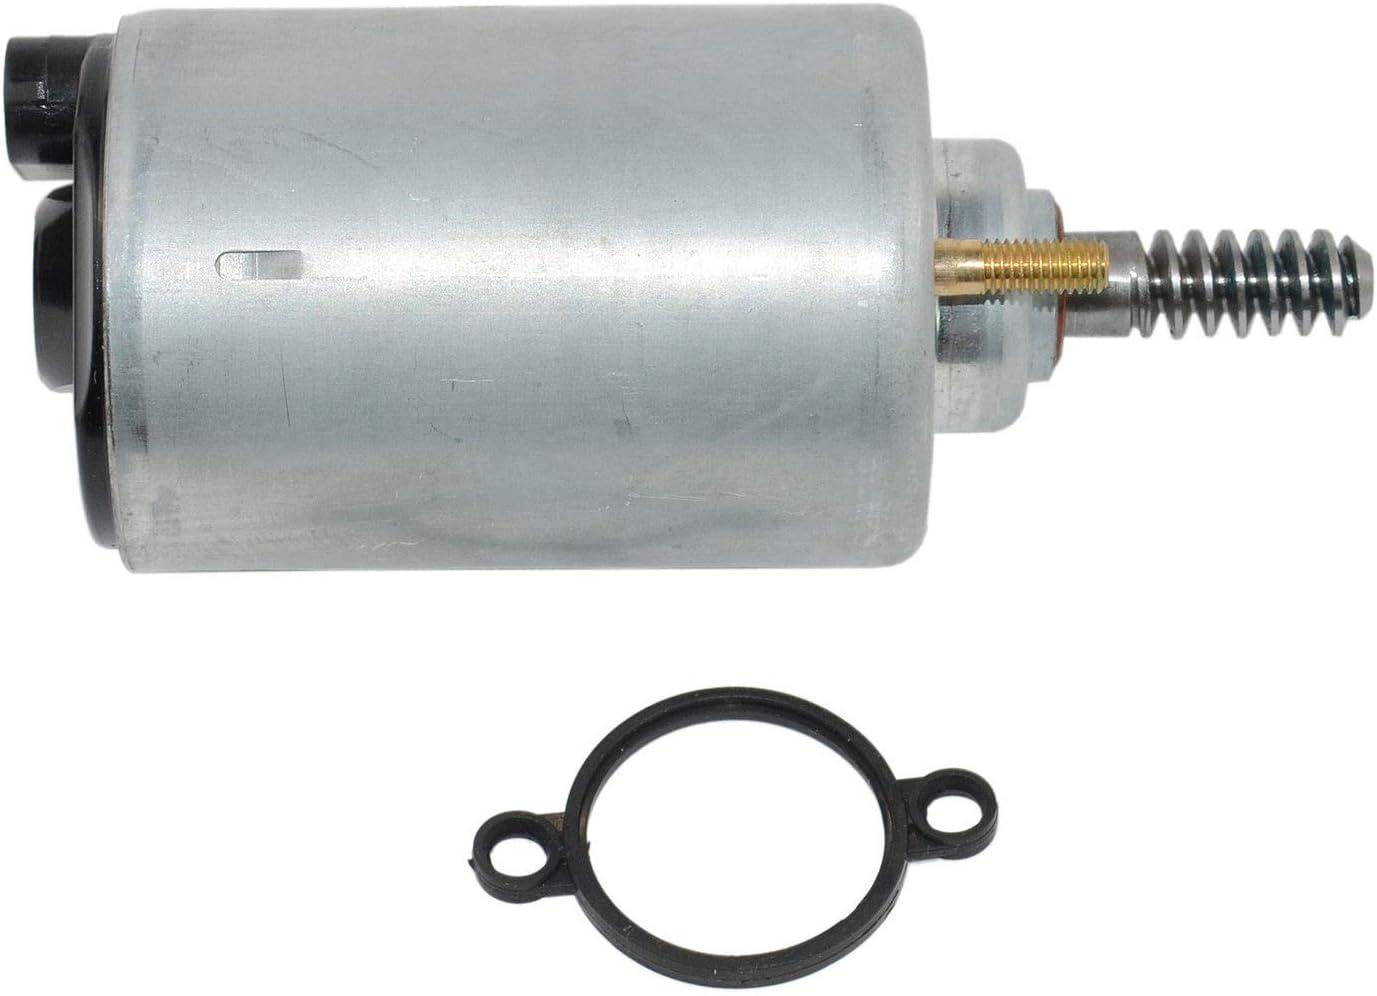 Valvetronic servo motore attuatore valvola variabile